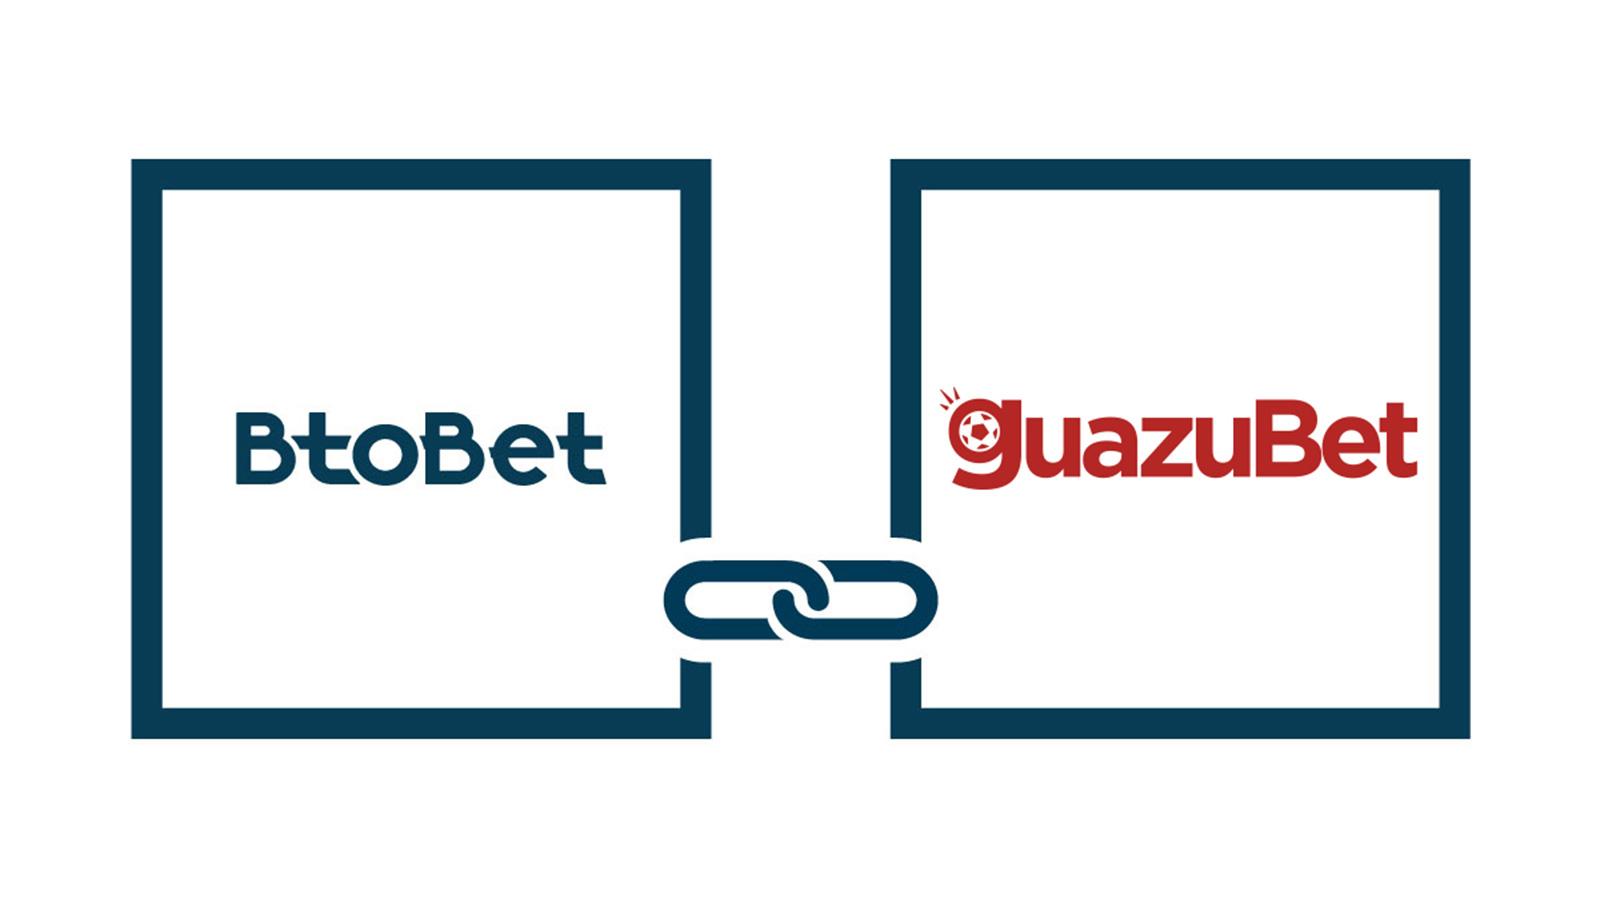 btobet-furthers-argentina-presence-with-guazubet-deal